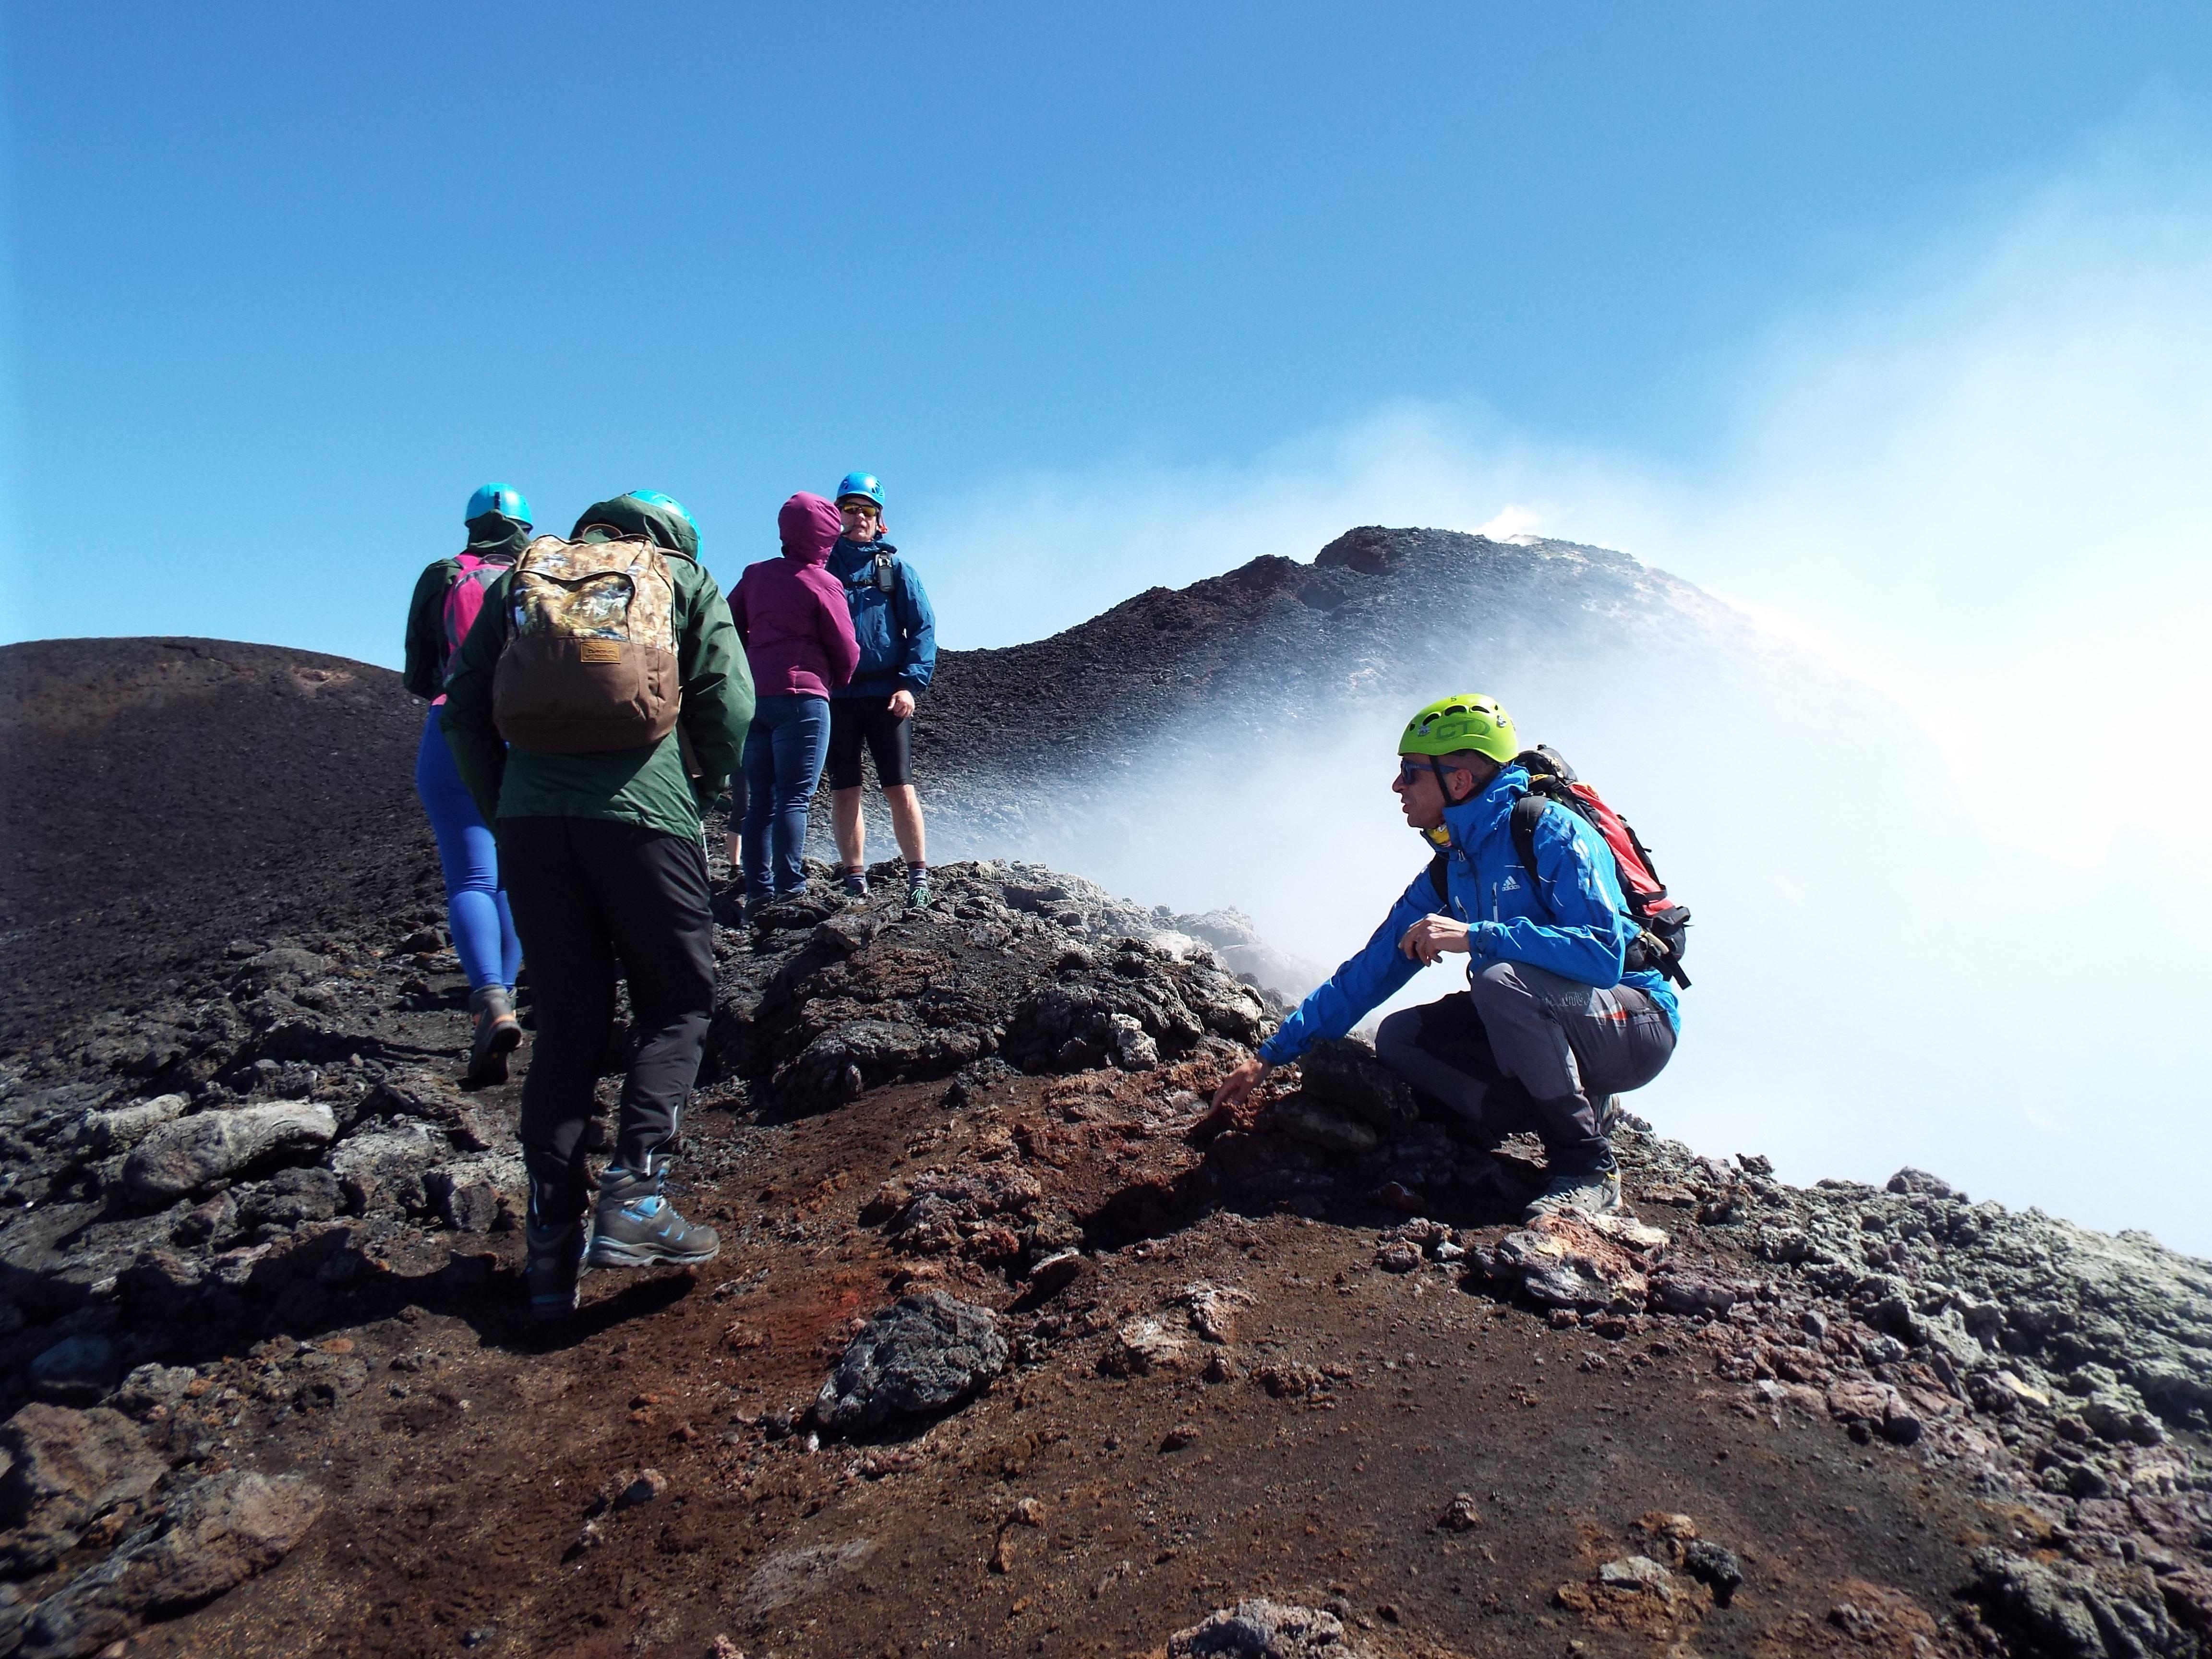 Cratère du sommet de l'Etna